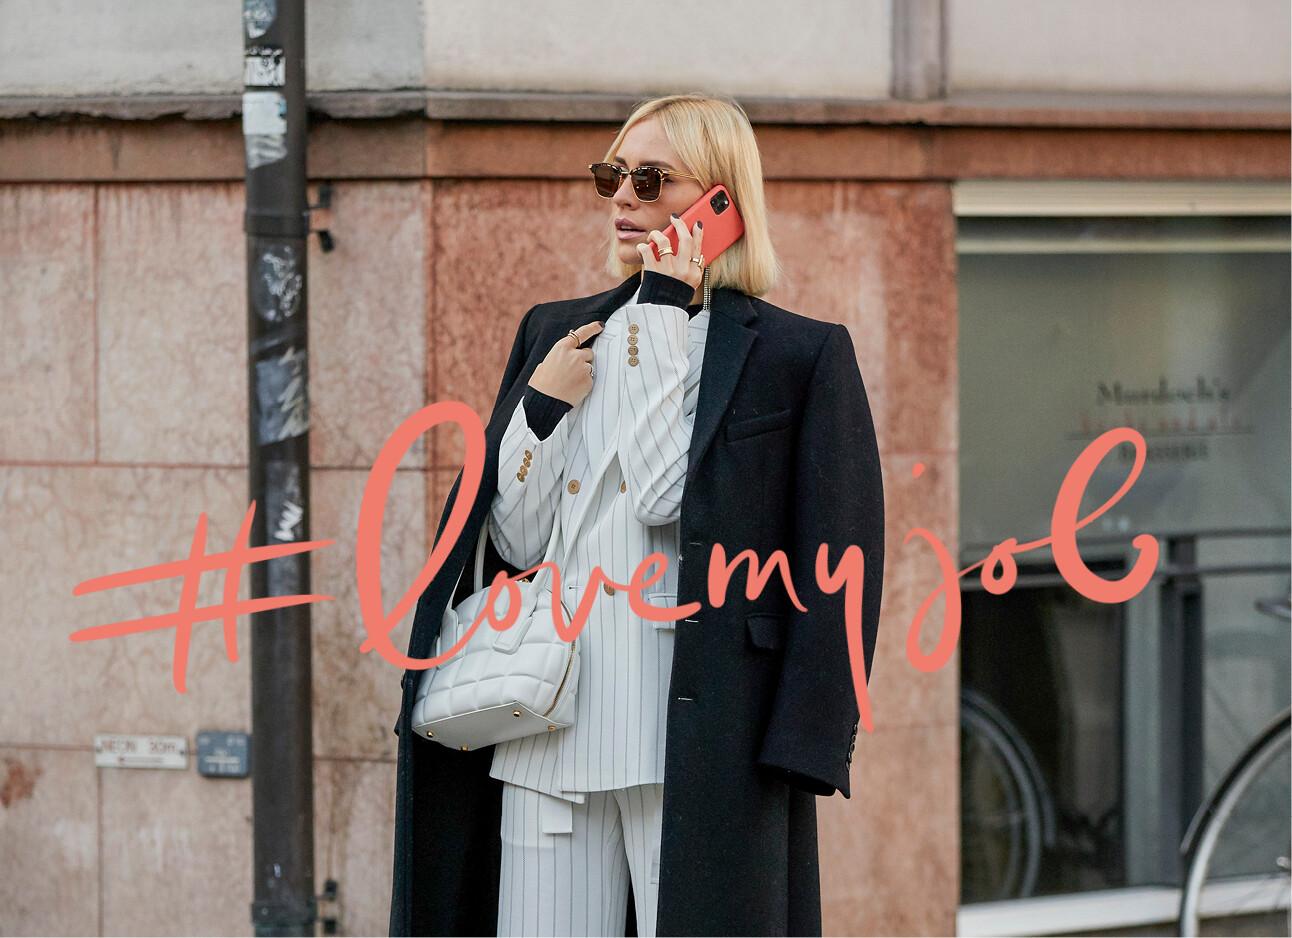 vrouw bellend op straat fashion